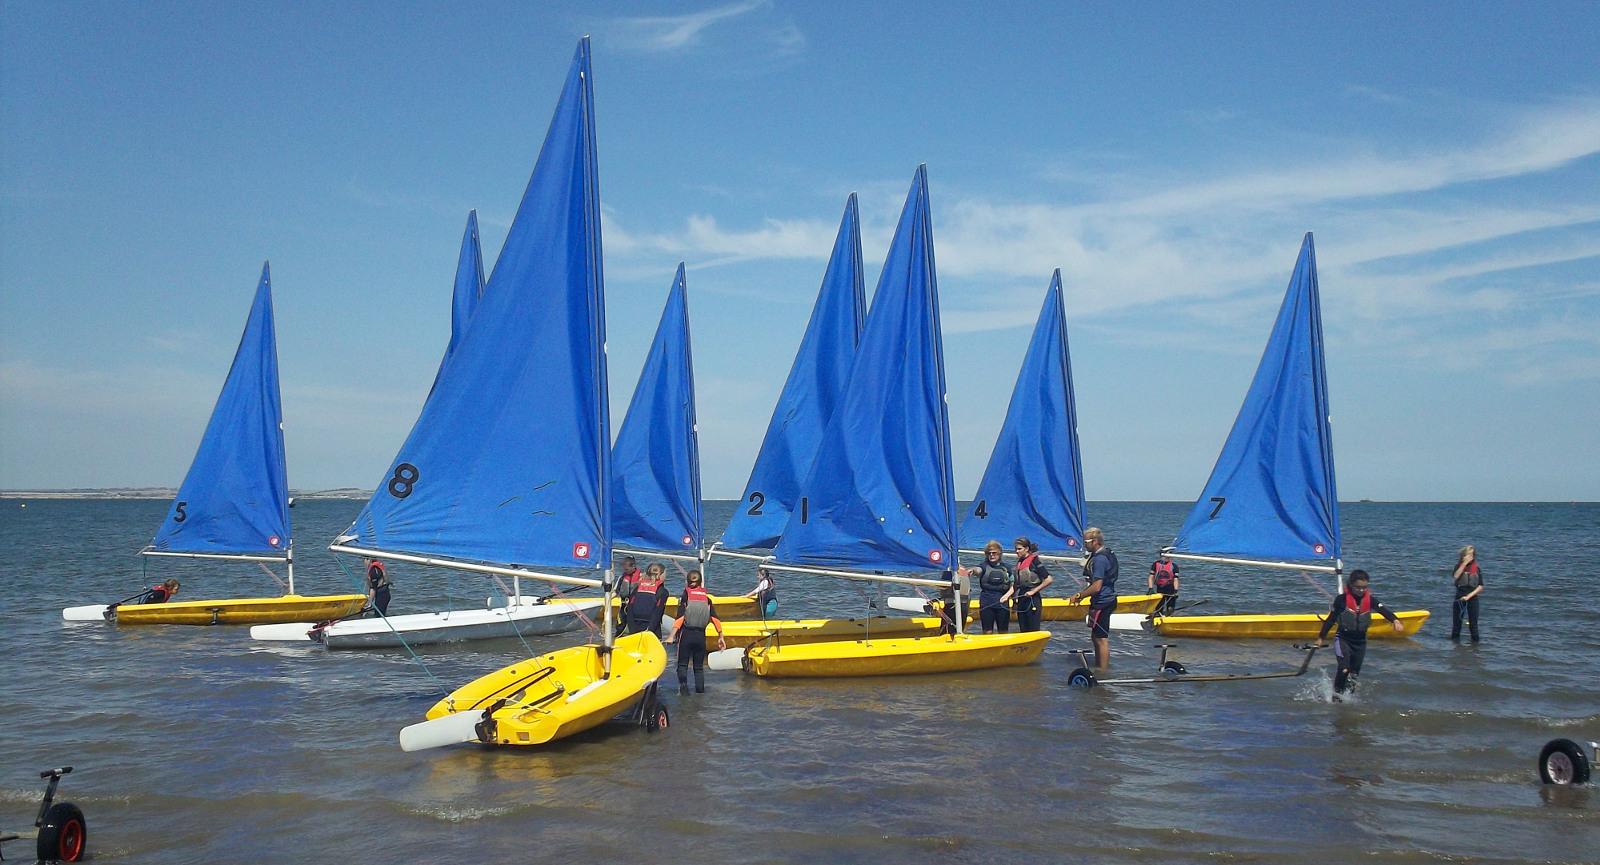 Sailing-&-windsurfing-whitstable